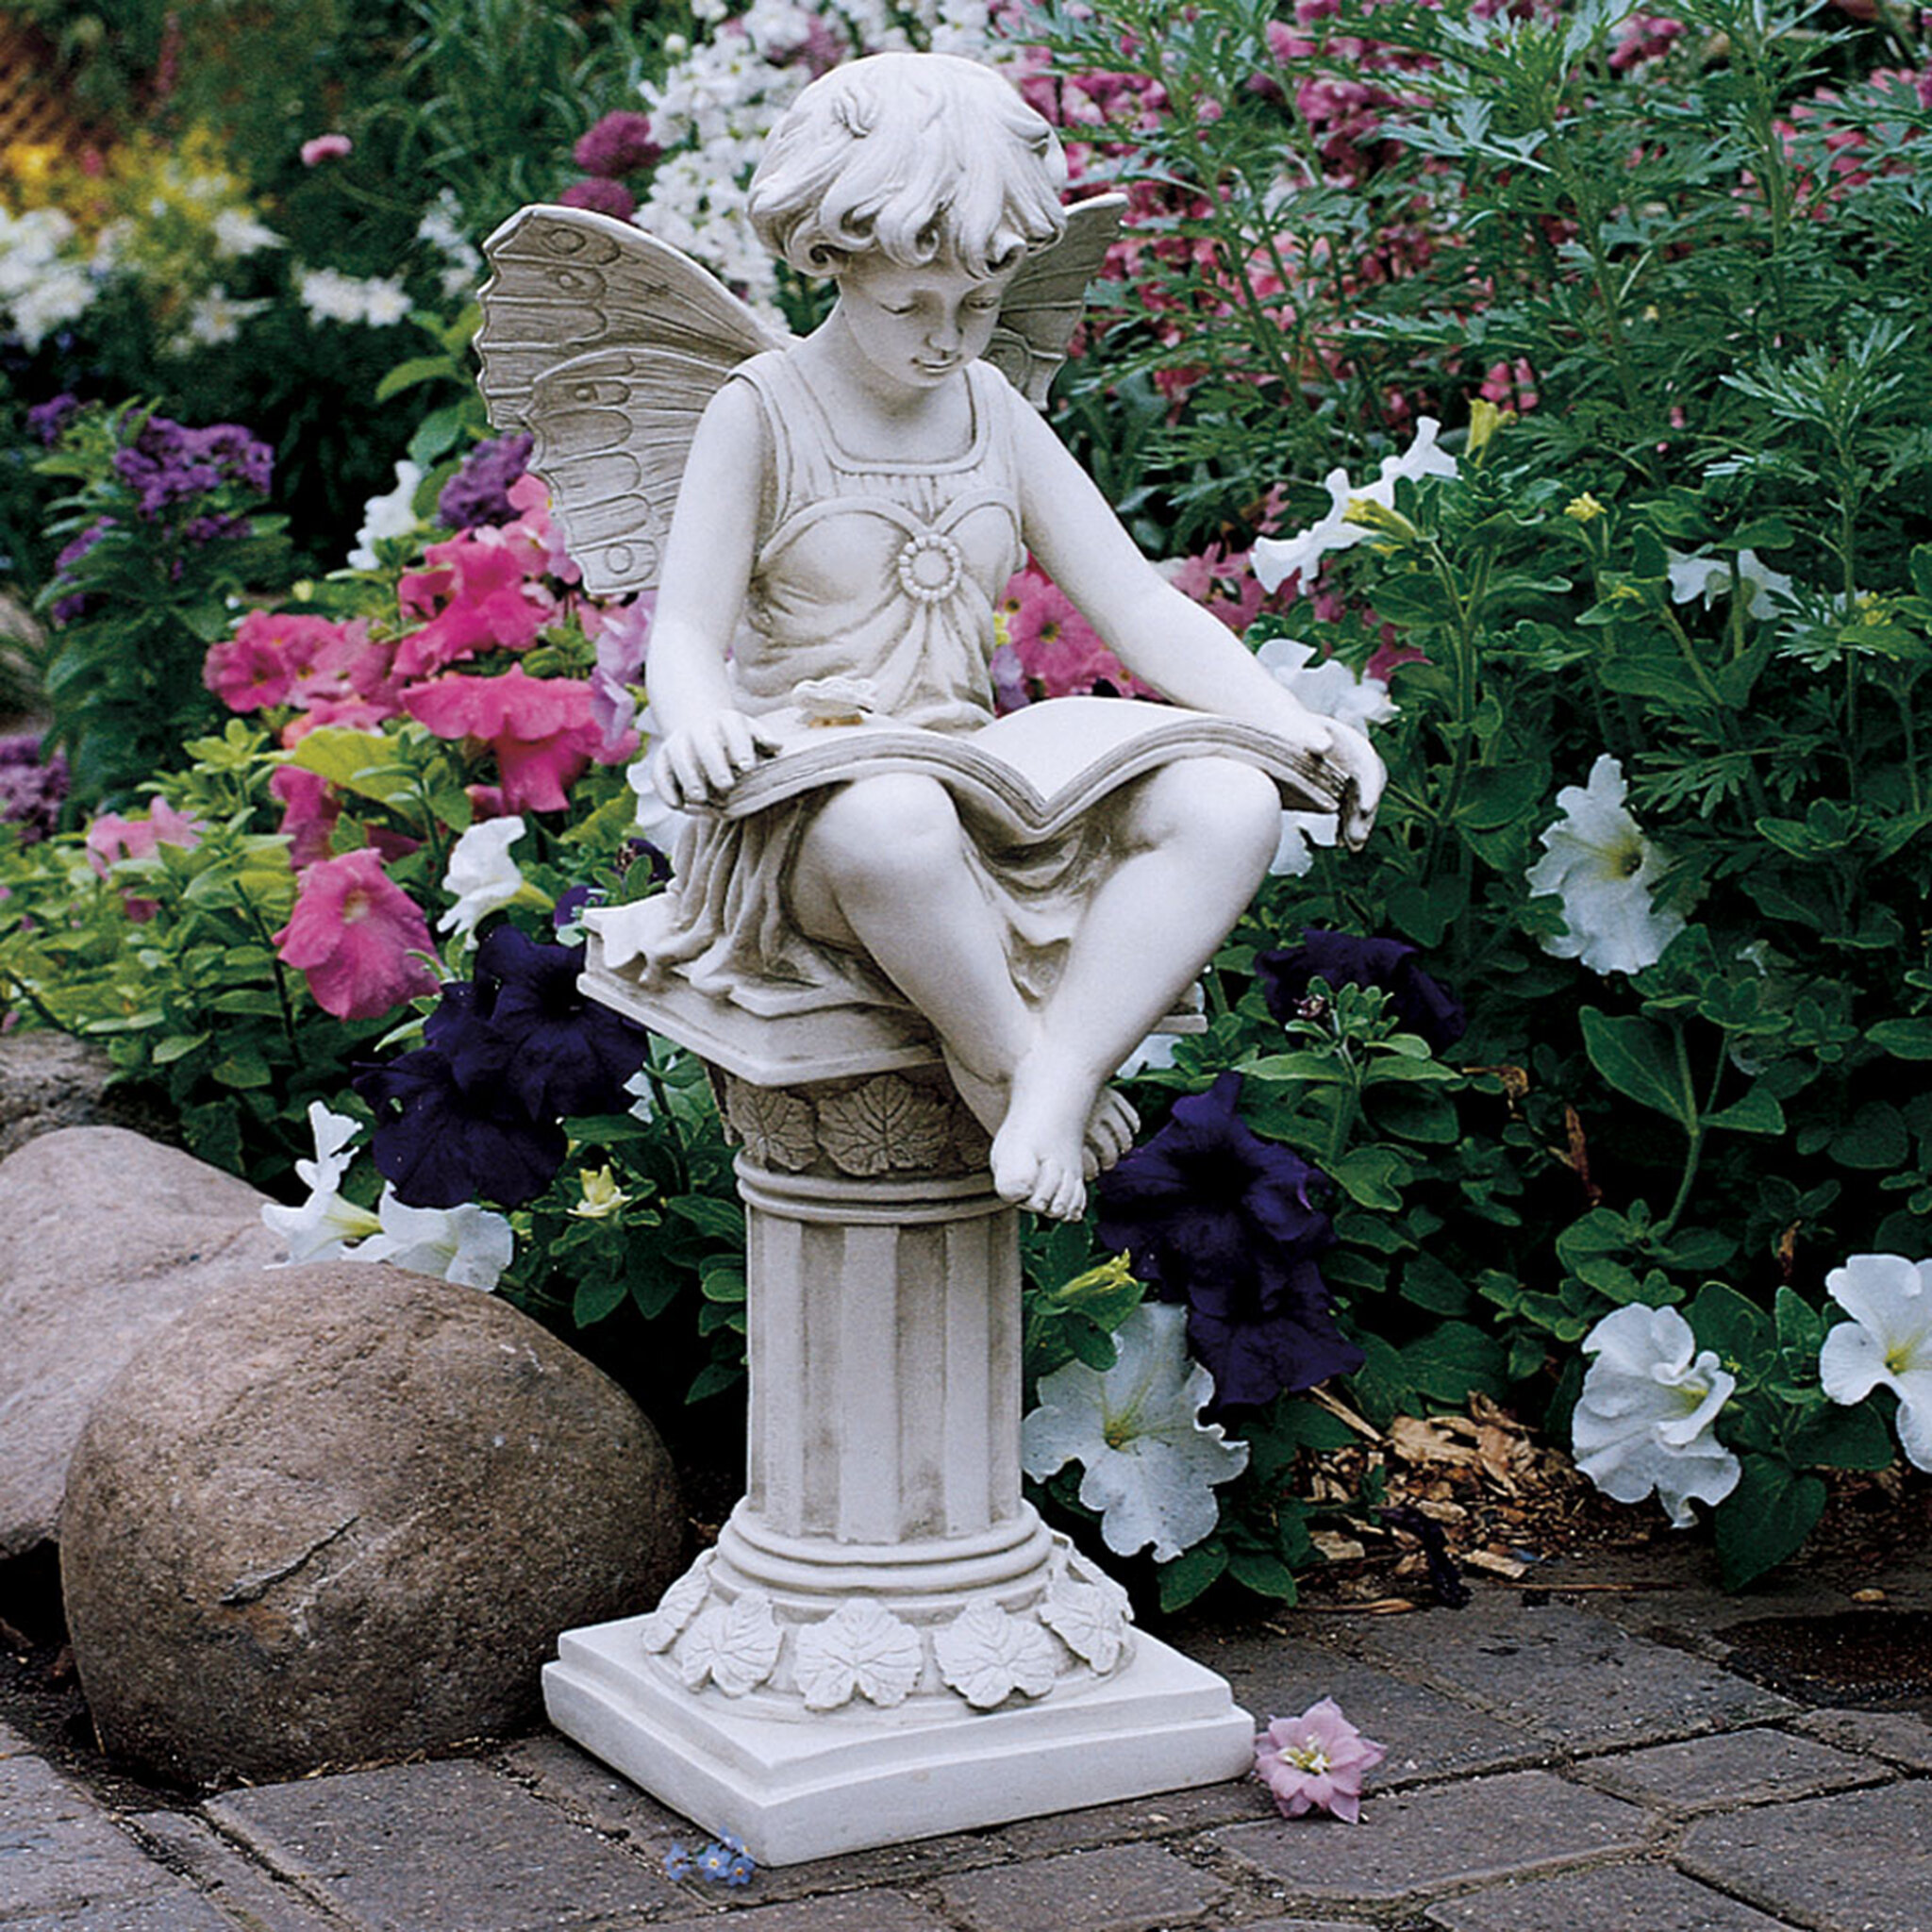 cast stone cat statue garden phoenix hayneedle international cfm master campania product